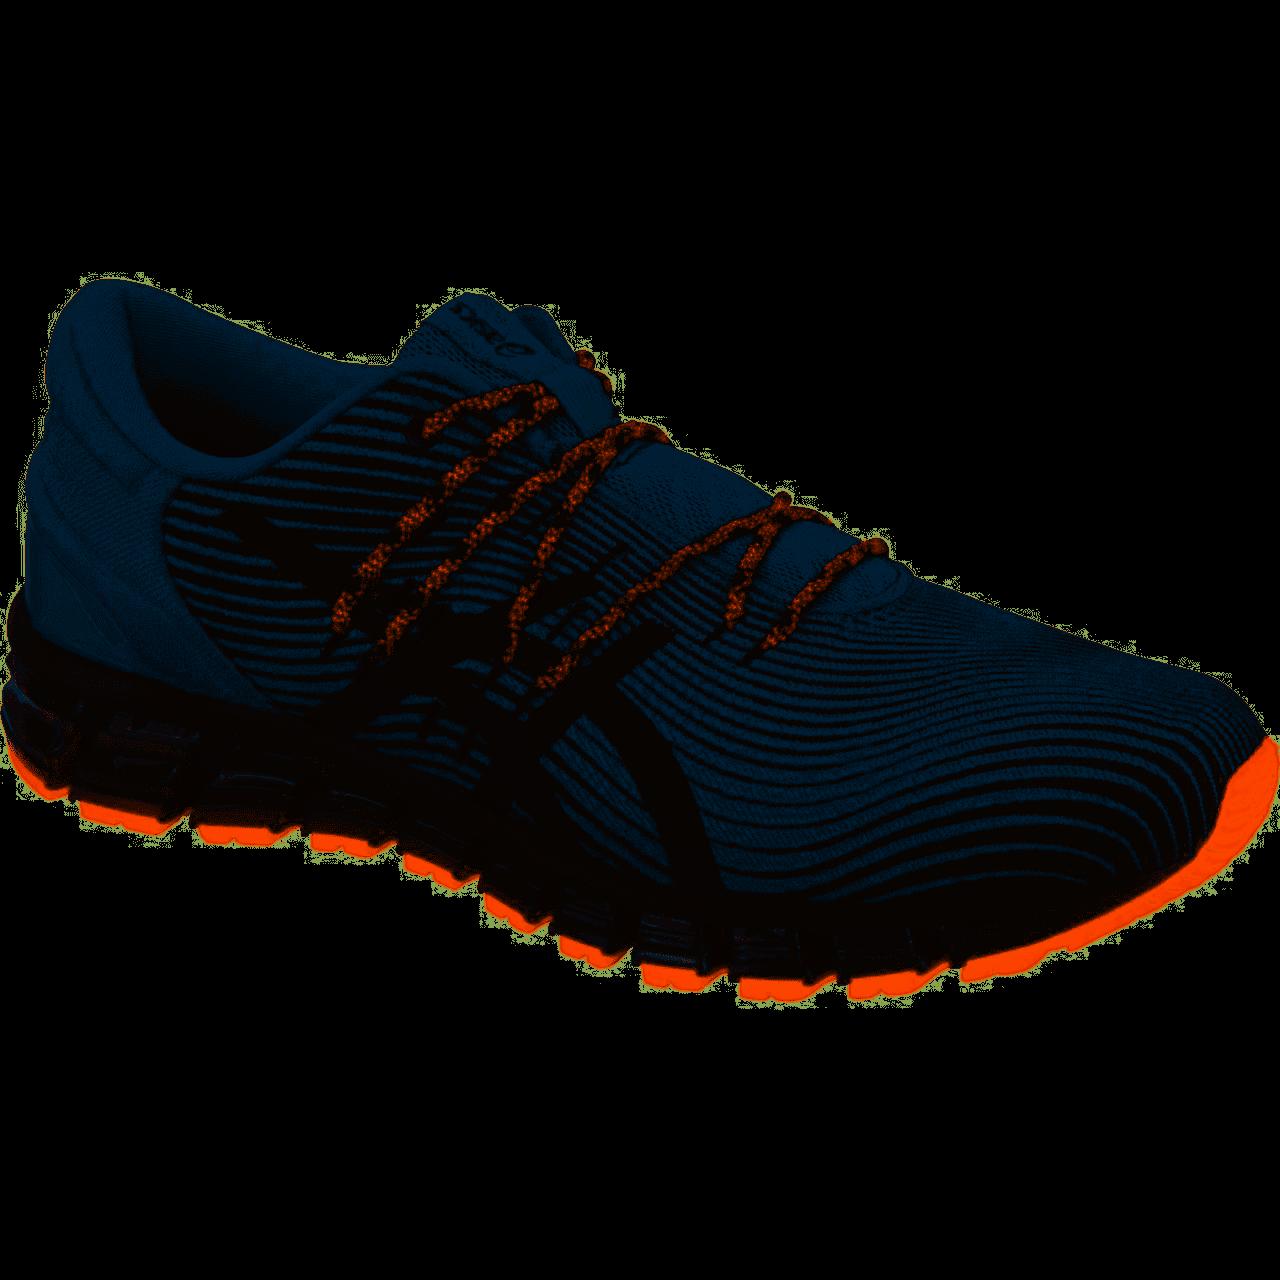 Asics GEL-Quantum 360 4 Men's Running shoes 1021A028.021 -Train Right